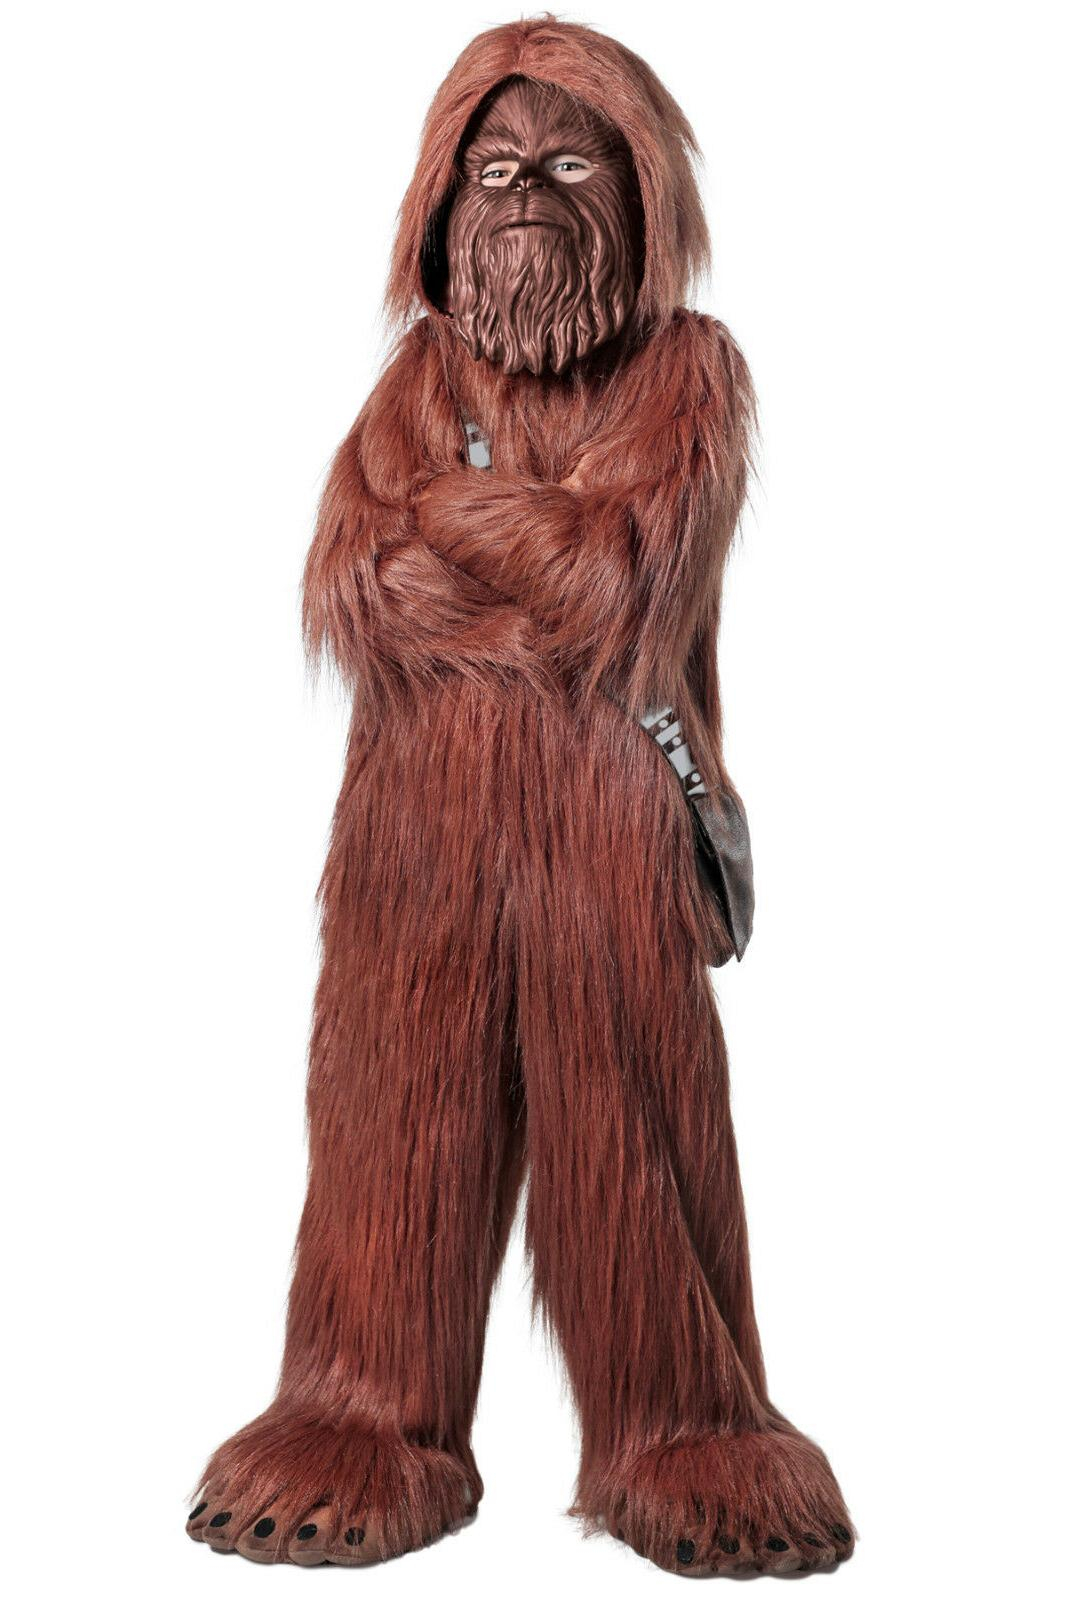 chewbacca wookie chewie premium deluxe star wars